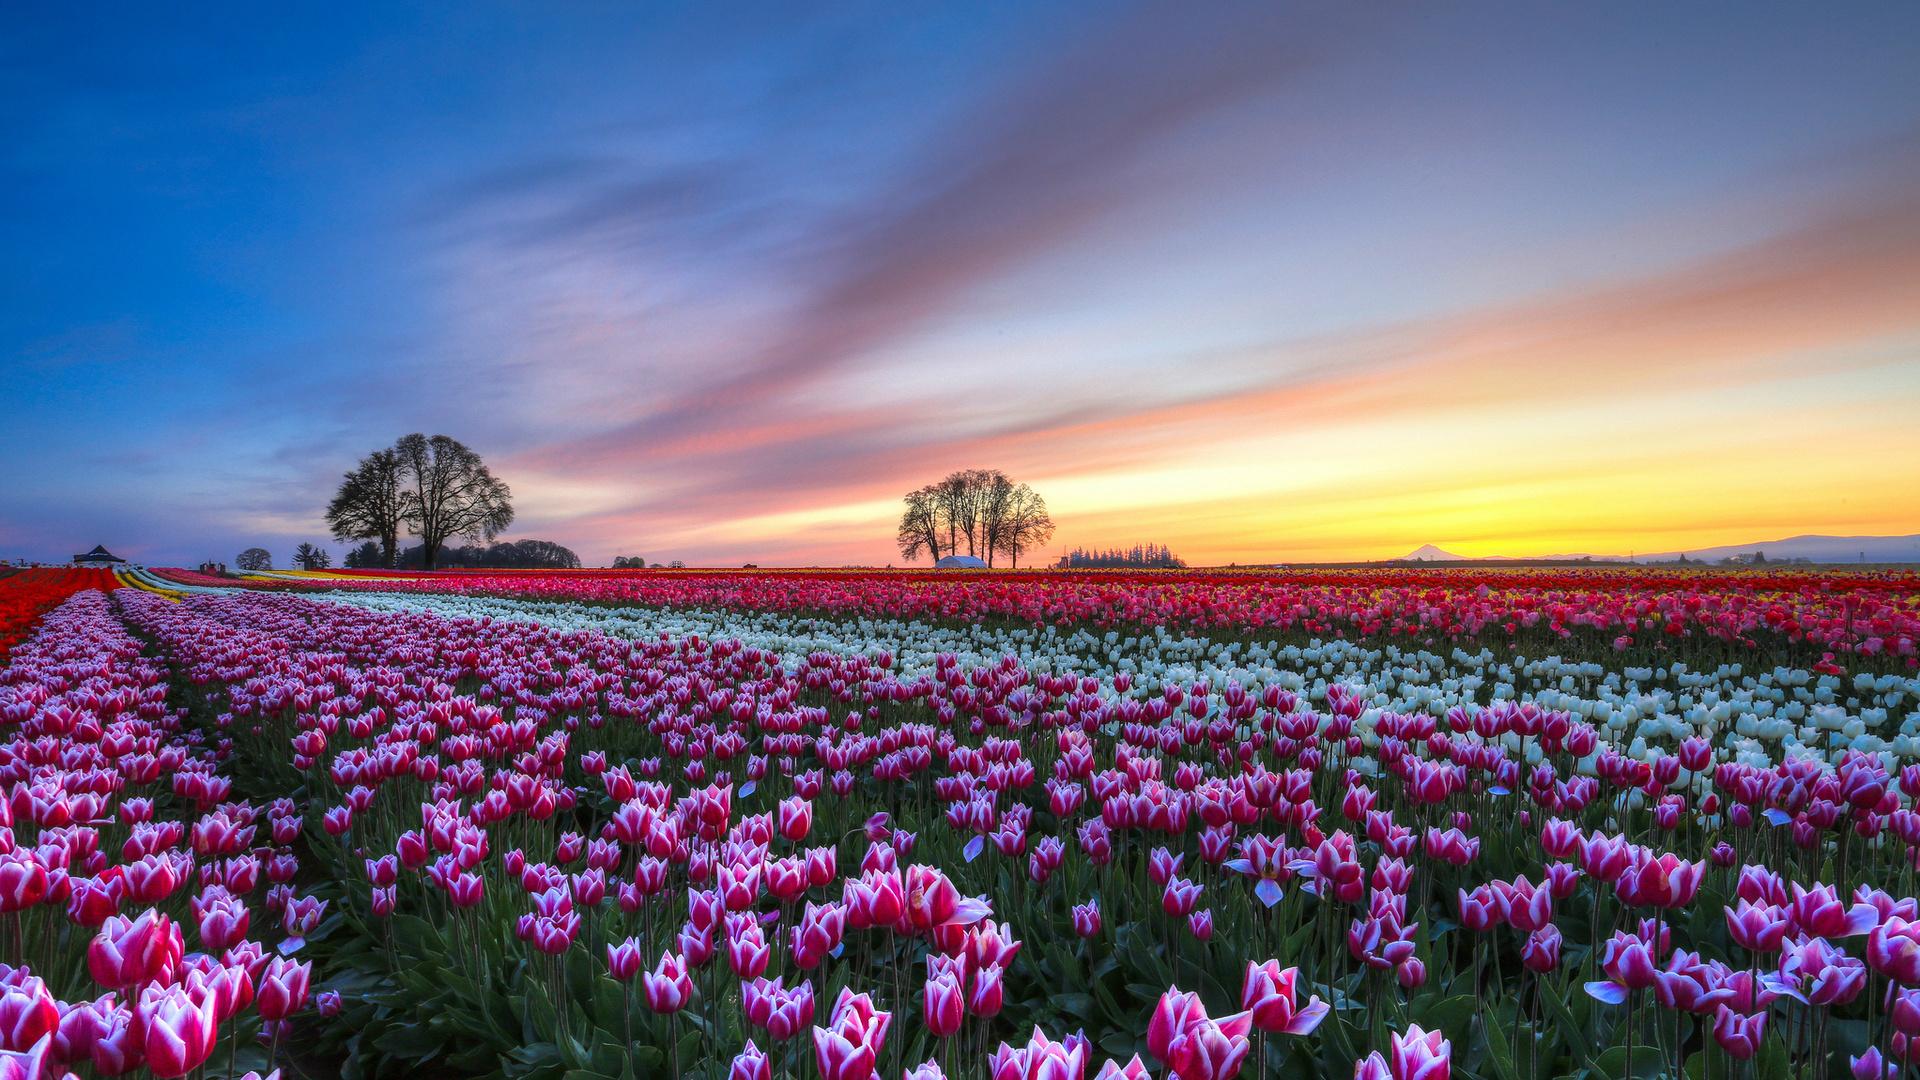 Beautiful Tulip Field Wallpaper